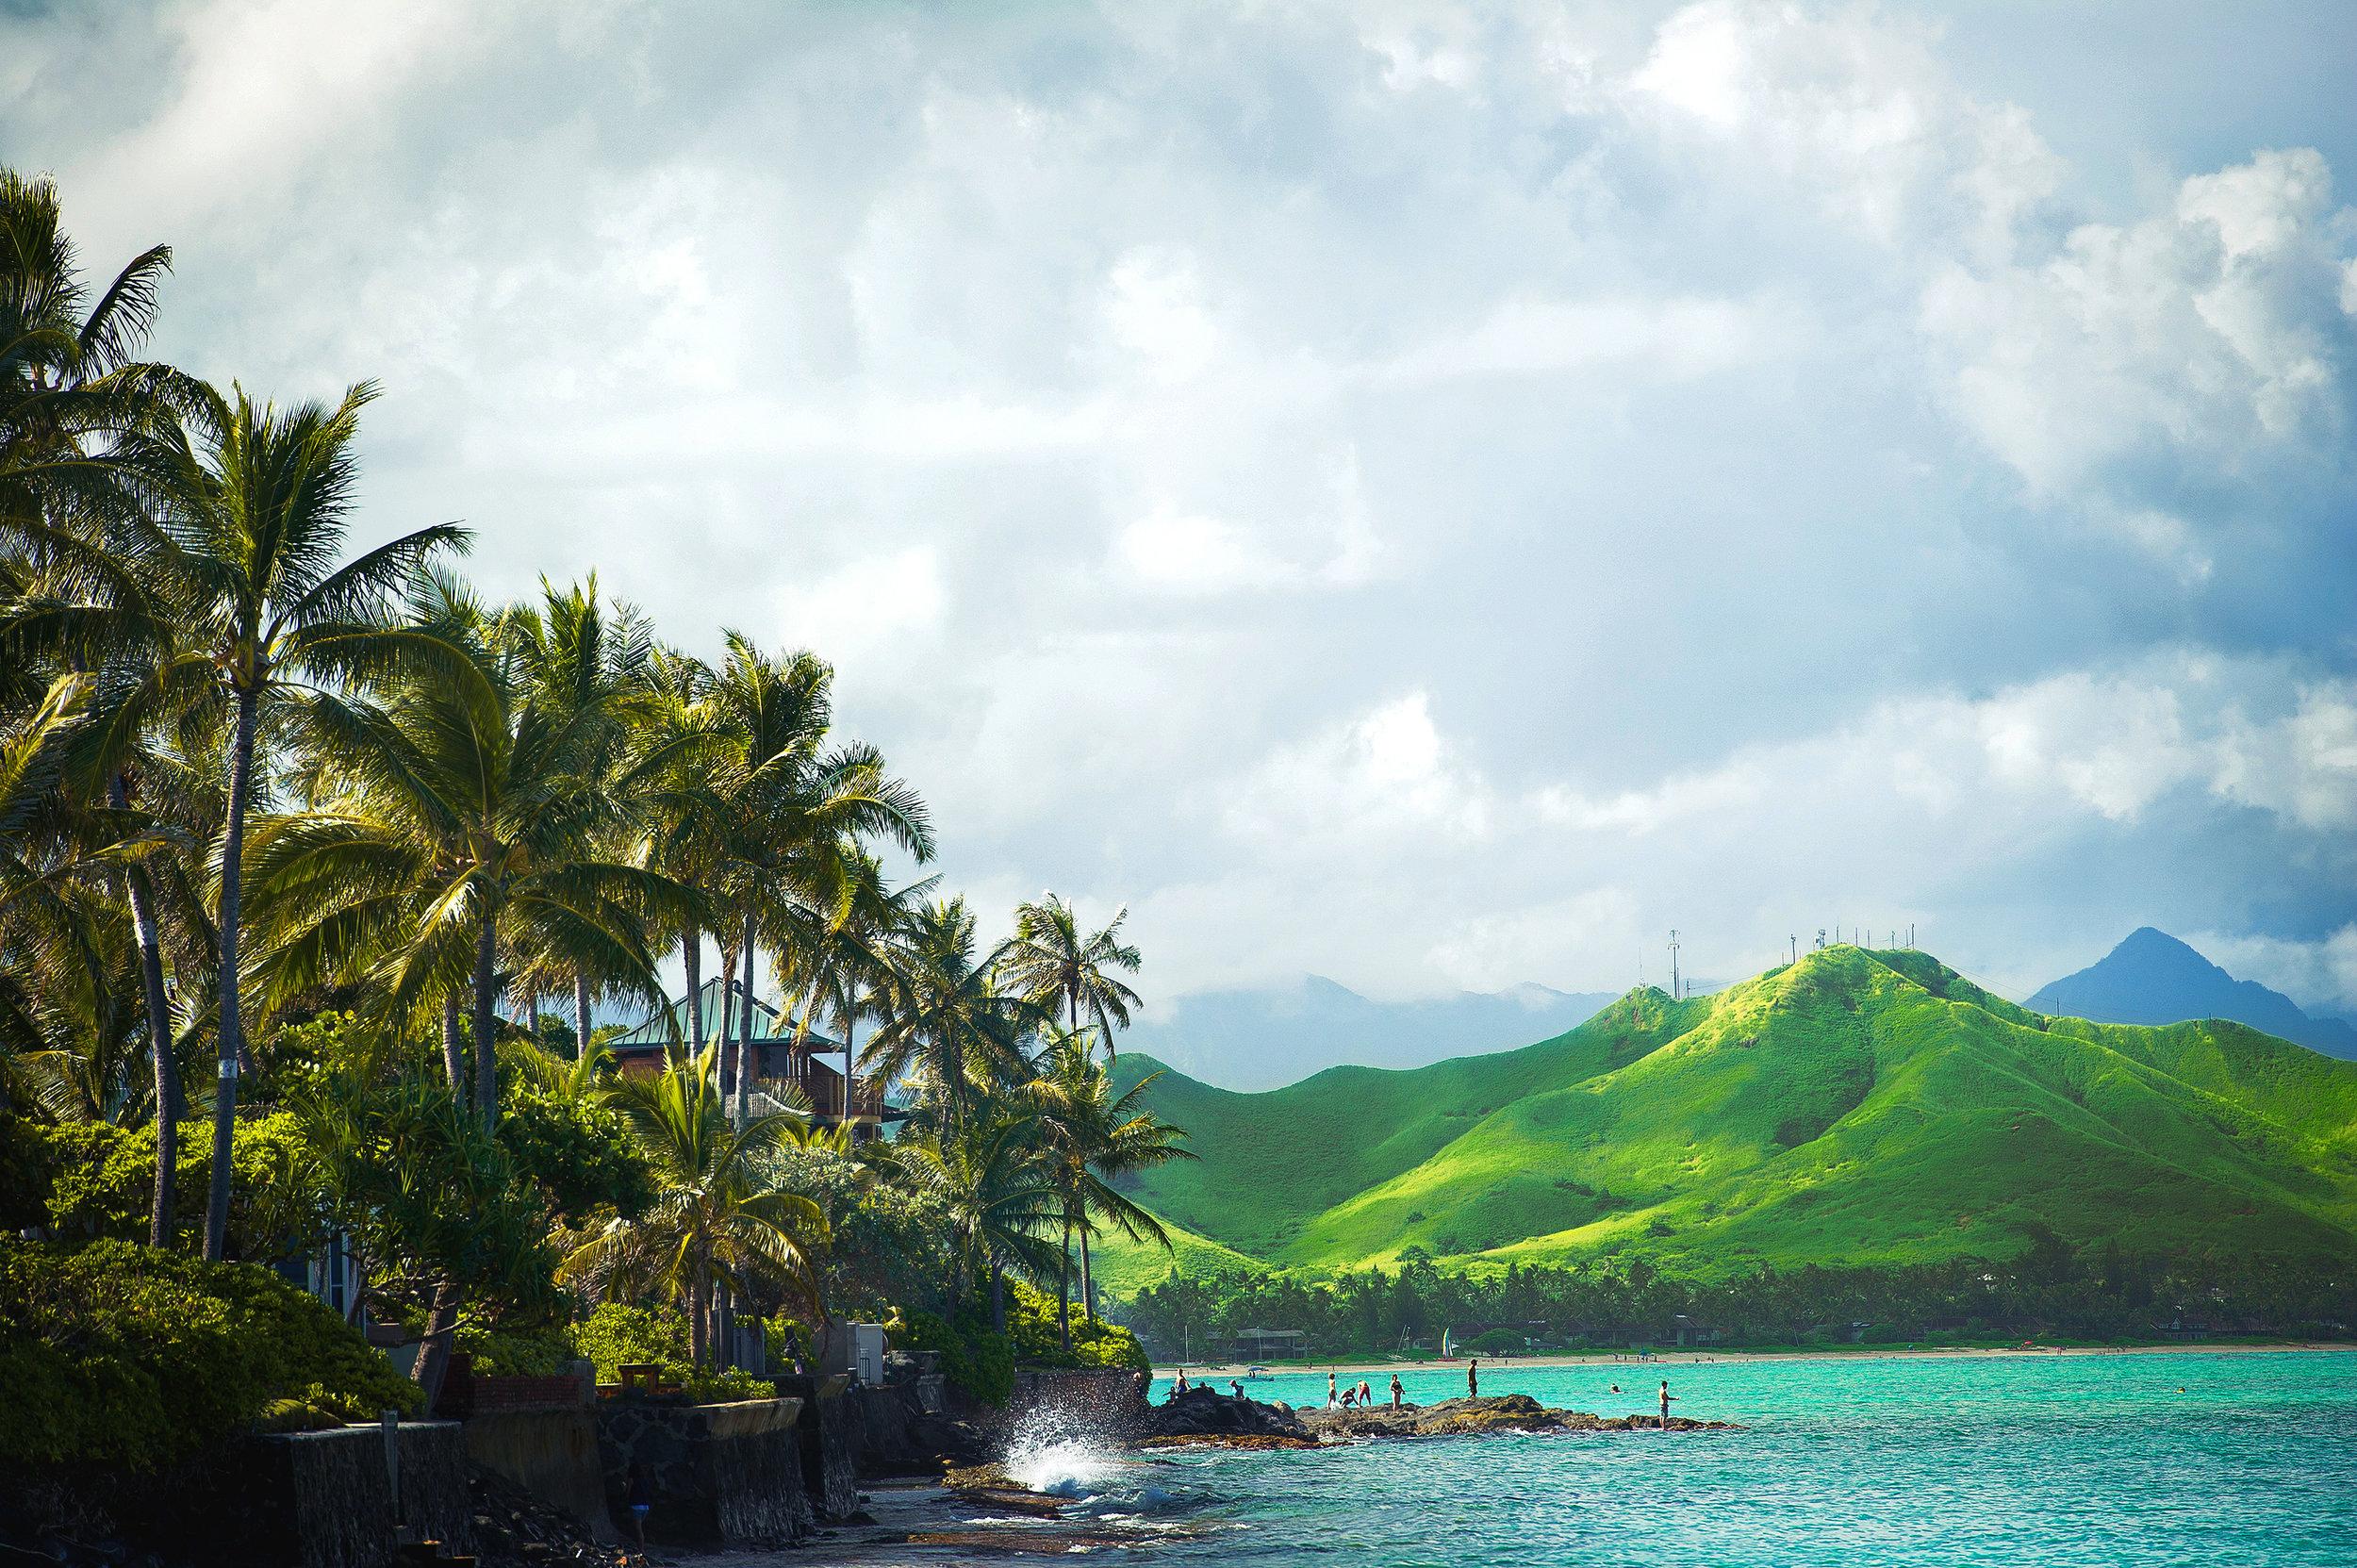 Sell Land in Oahu HI Fast